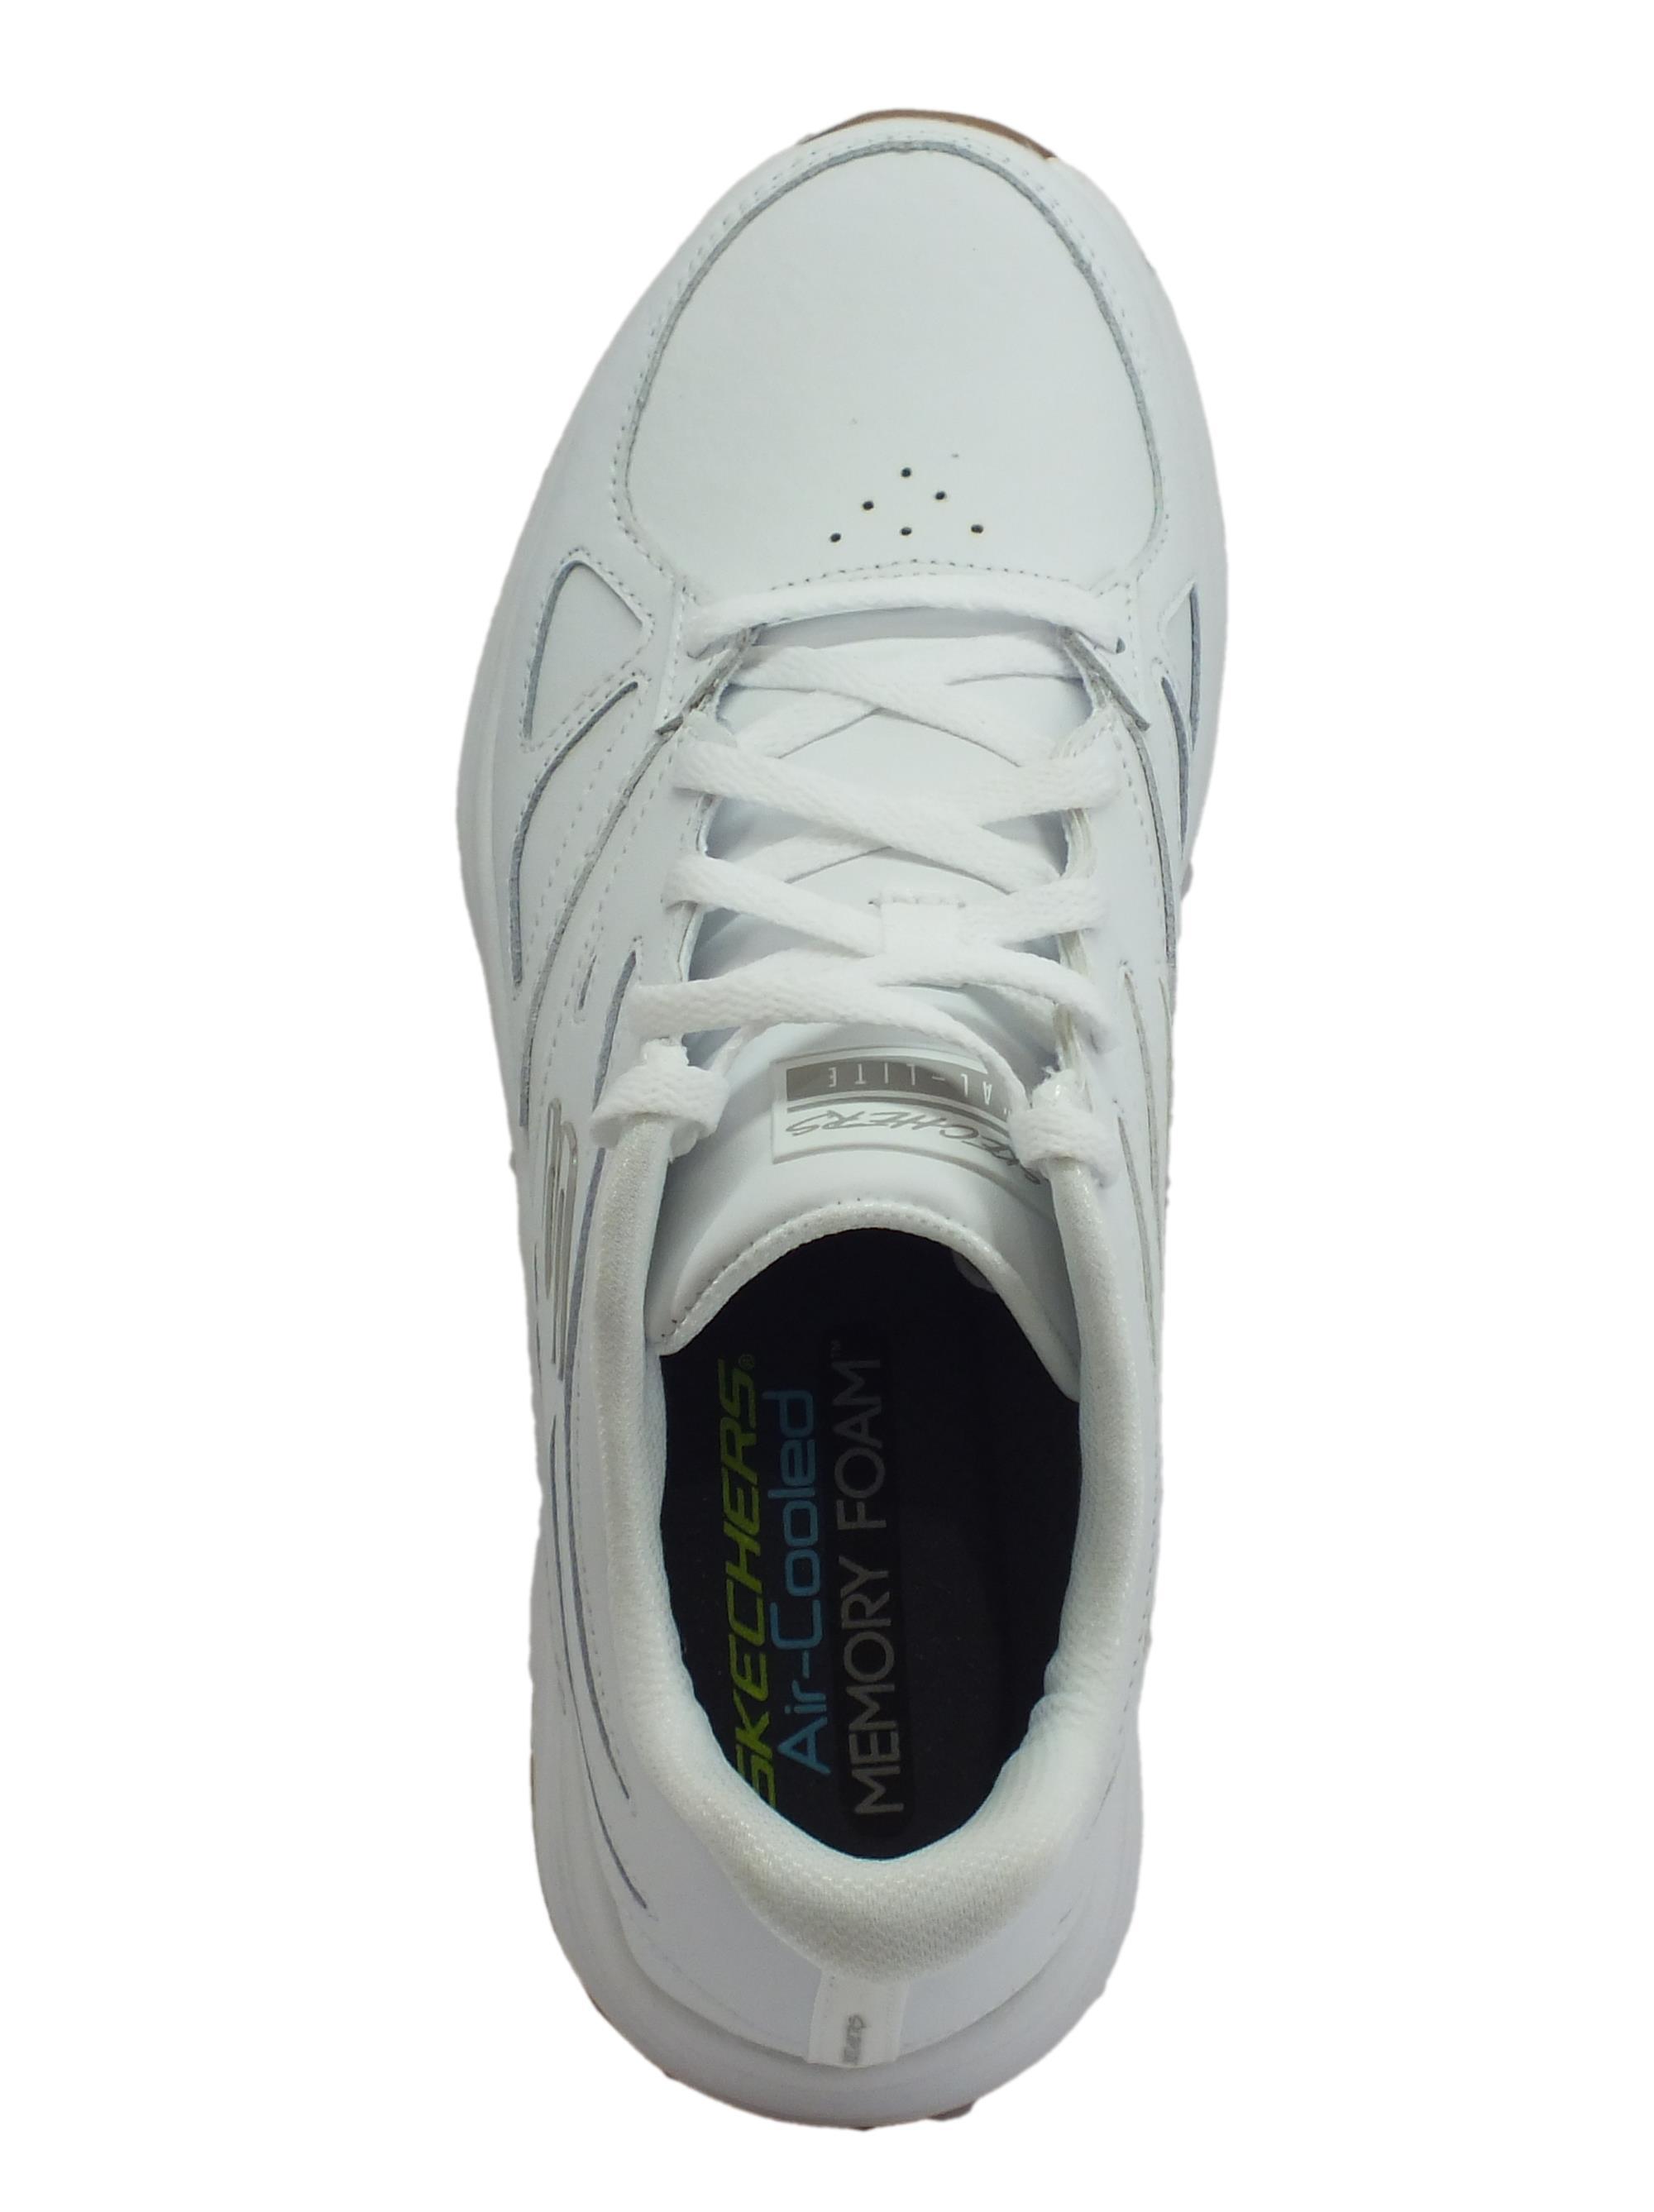 ... Skechers Skyline Woodmist White scarpe sportive uomo in pelle bianca aff3c8b3891